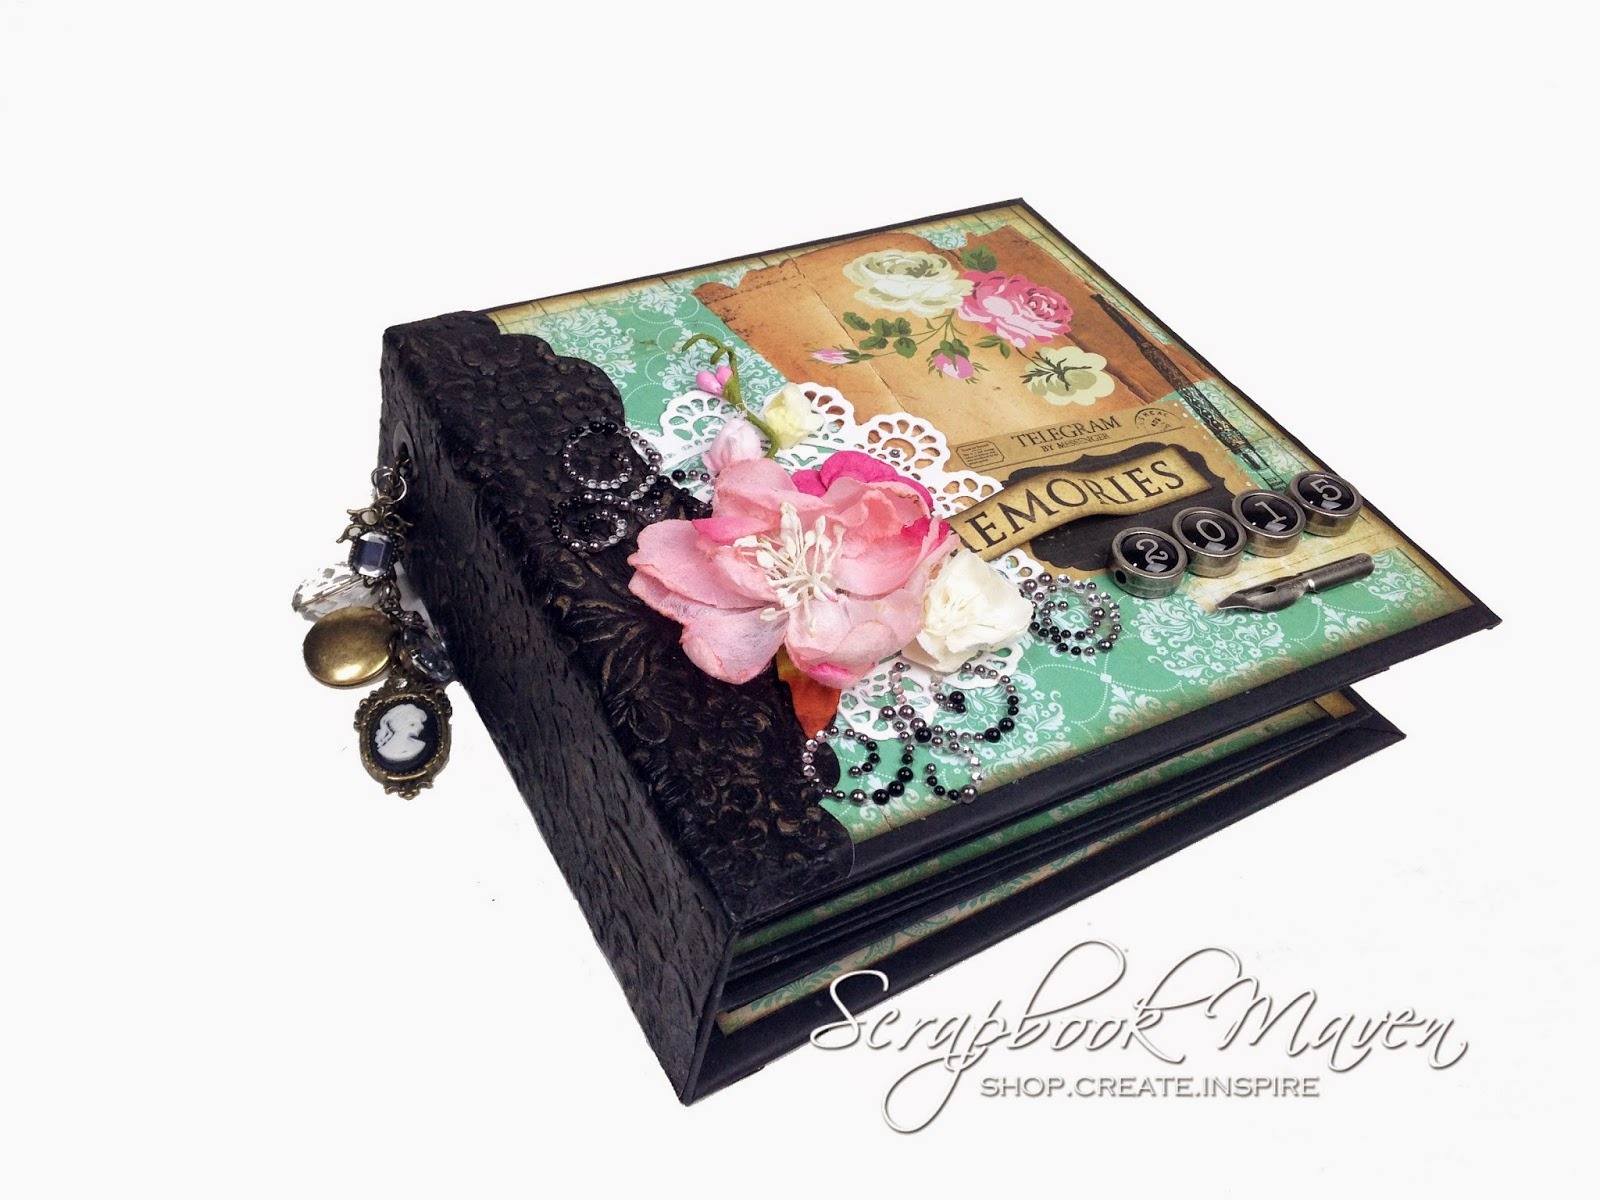 Marion Smith Designs Romance Novel Ch. 2 Scrap Kit available at ScrapbookMaven.com